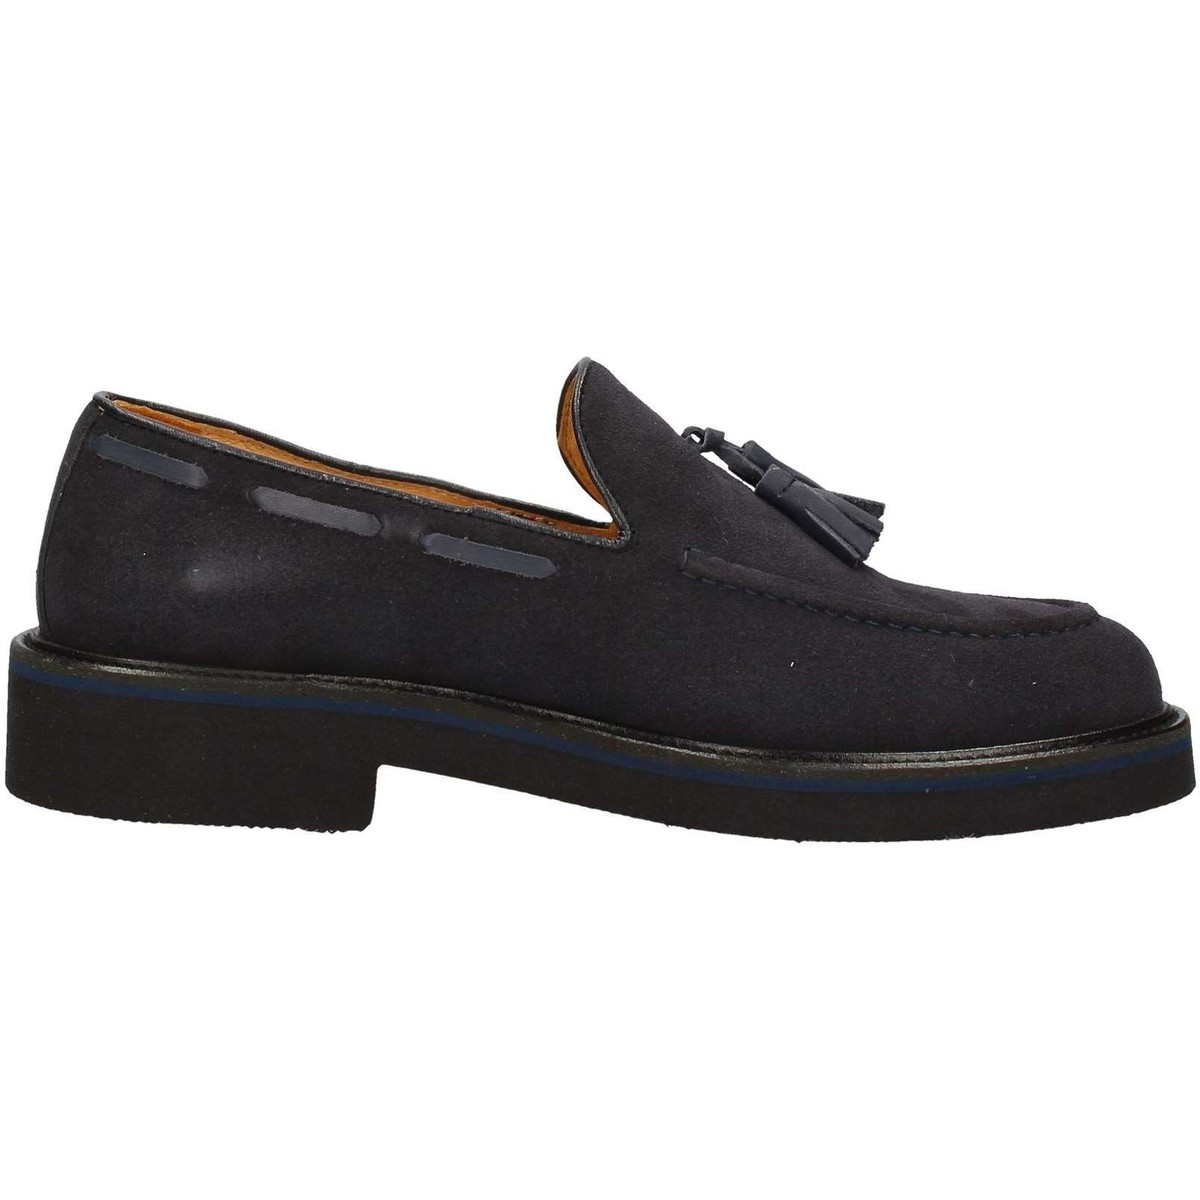 Hudson 9020 Mokassin Mann Blau Blau - Schuhe Slipper Herren 92,20 €